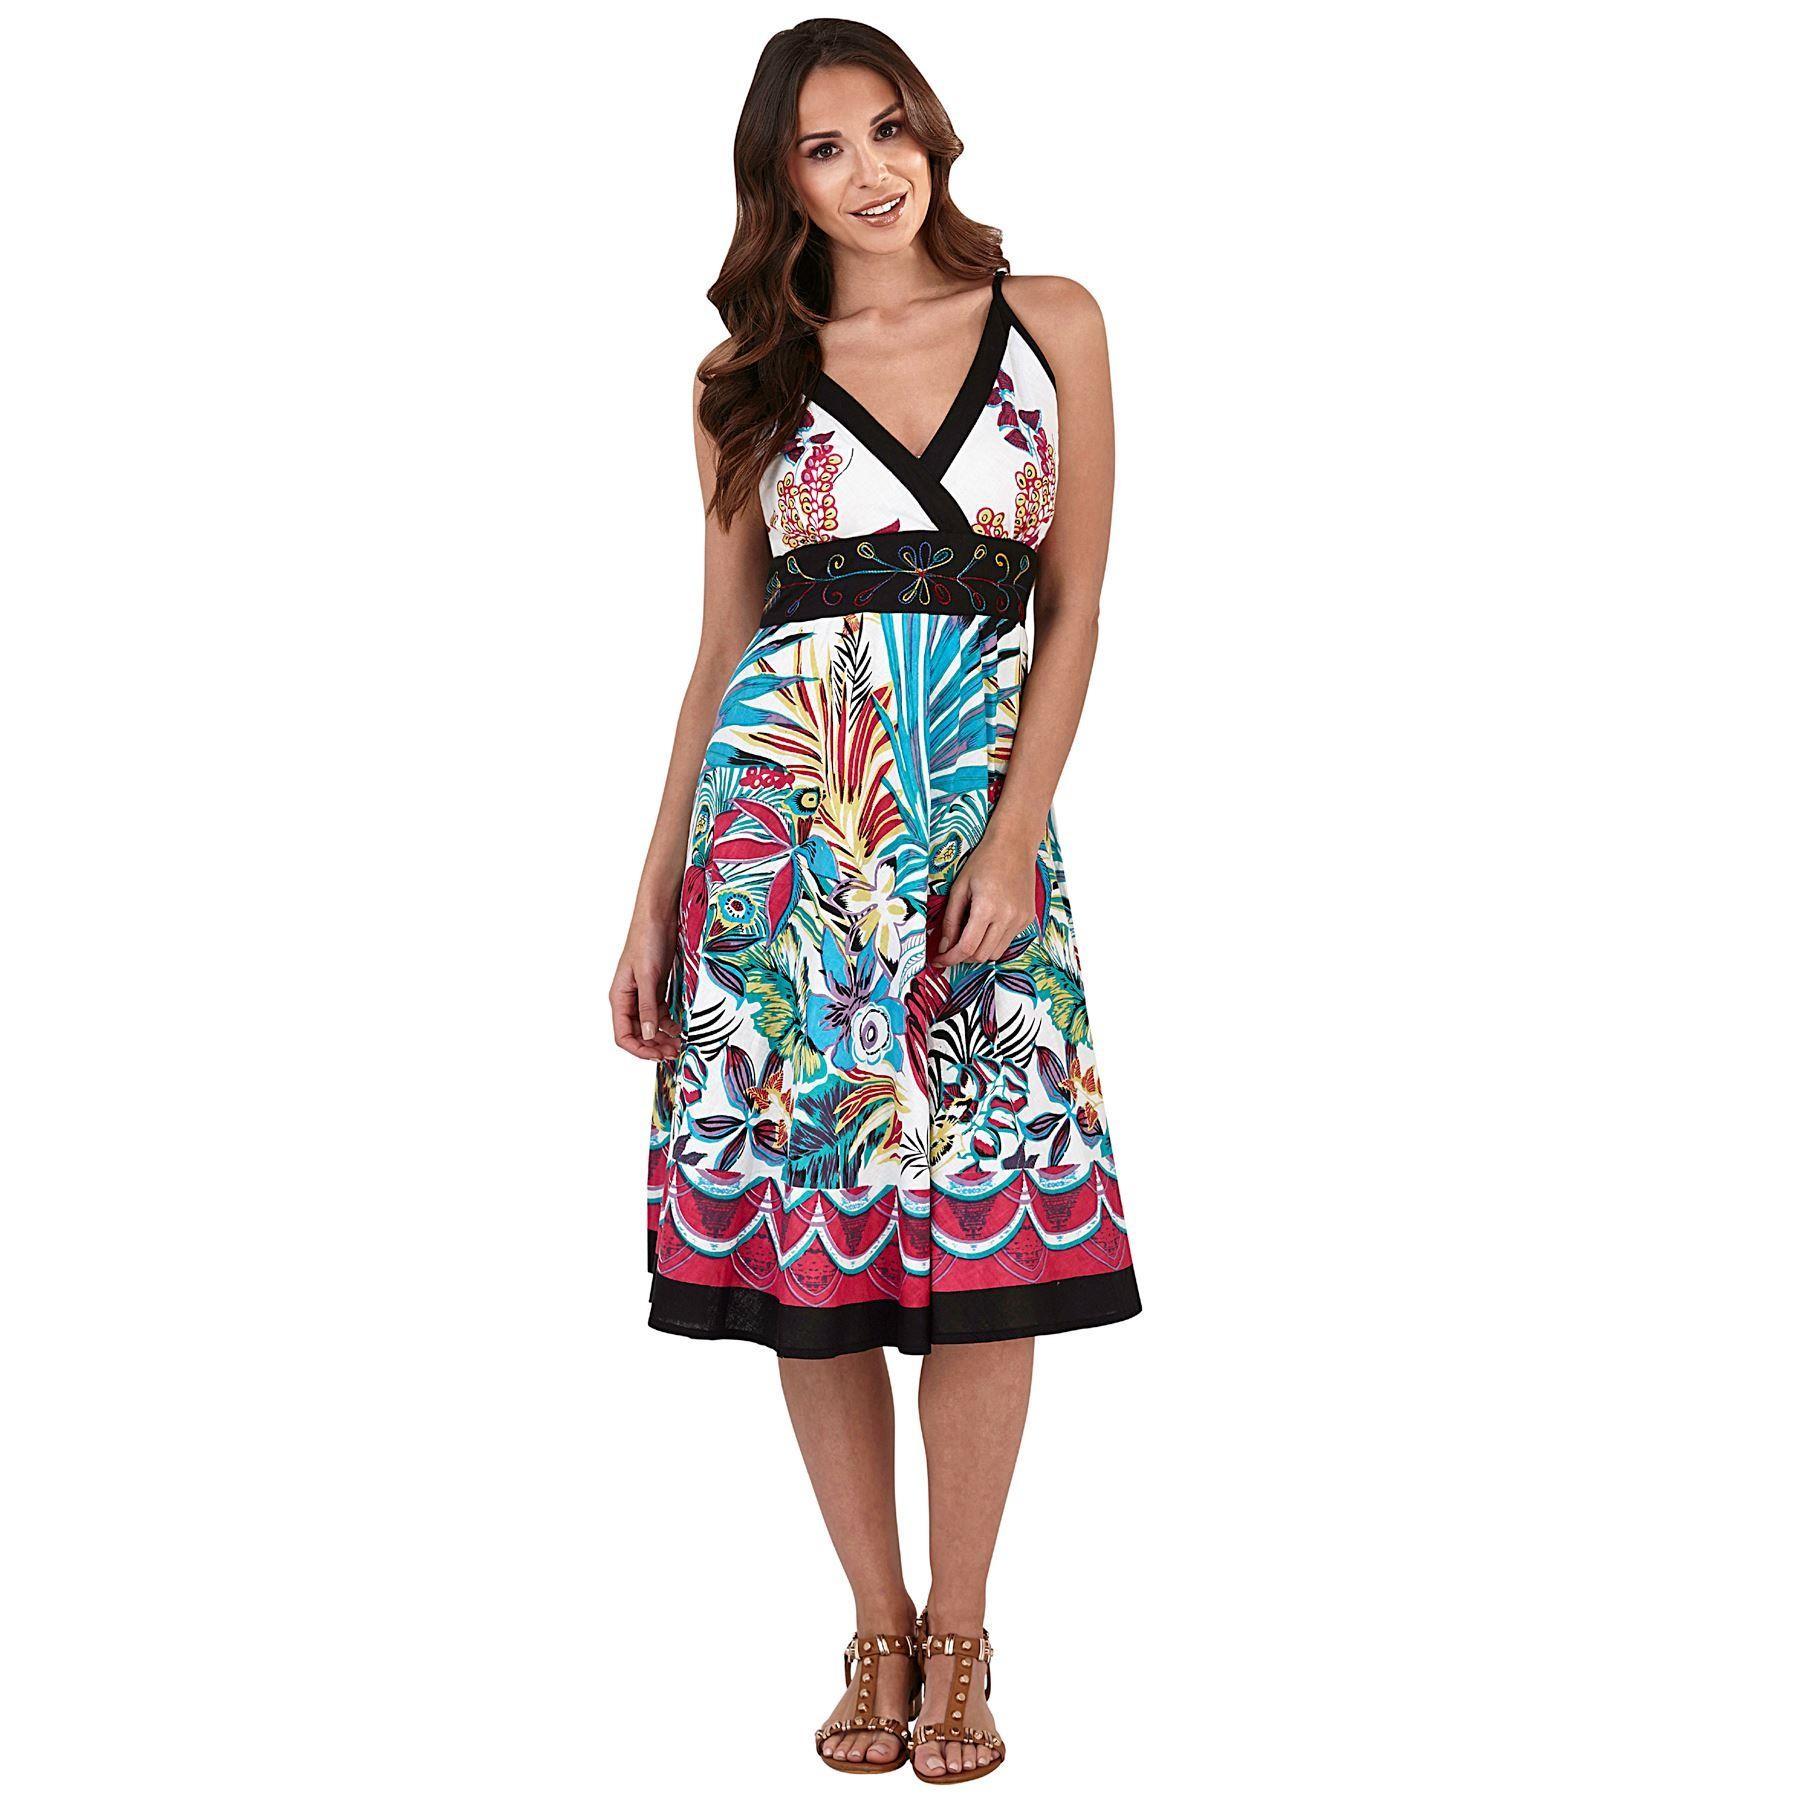 Pistachio Tropical Print Crossover Dress - Black